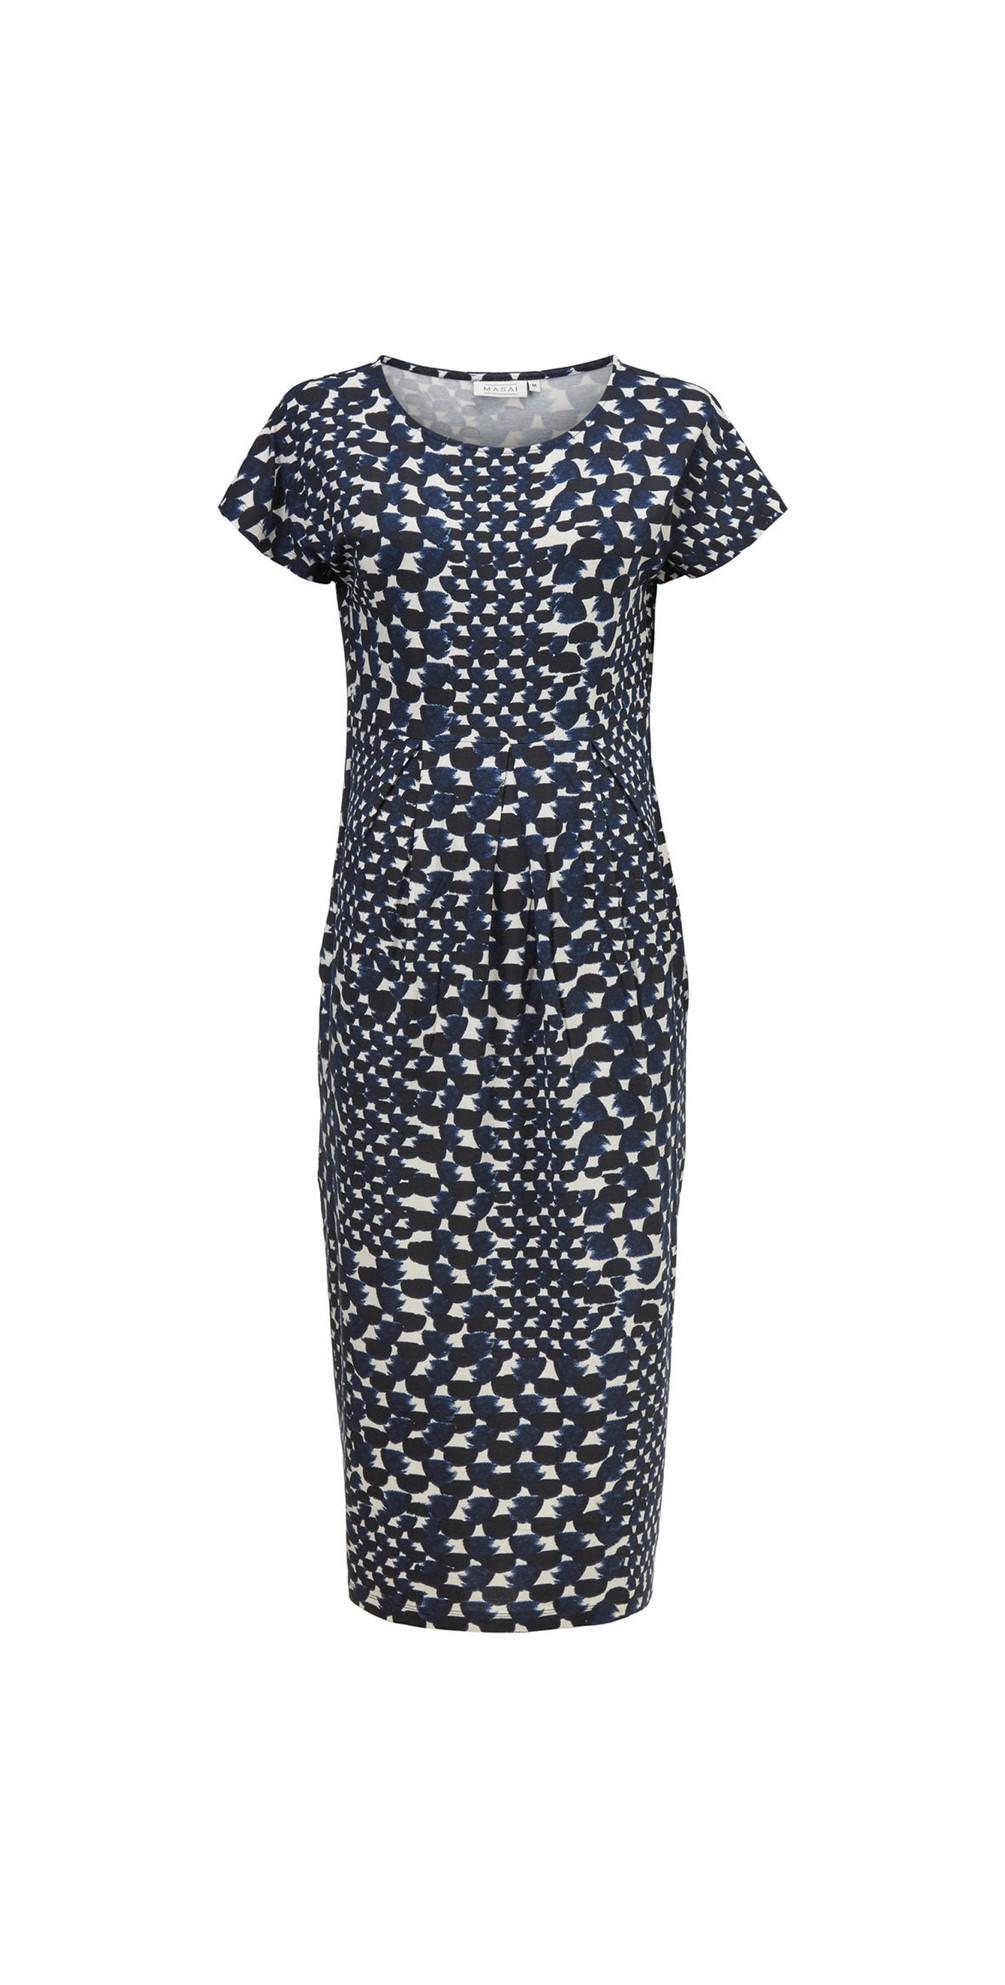 Olnia Dress main image